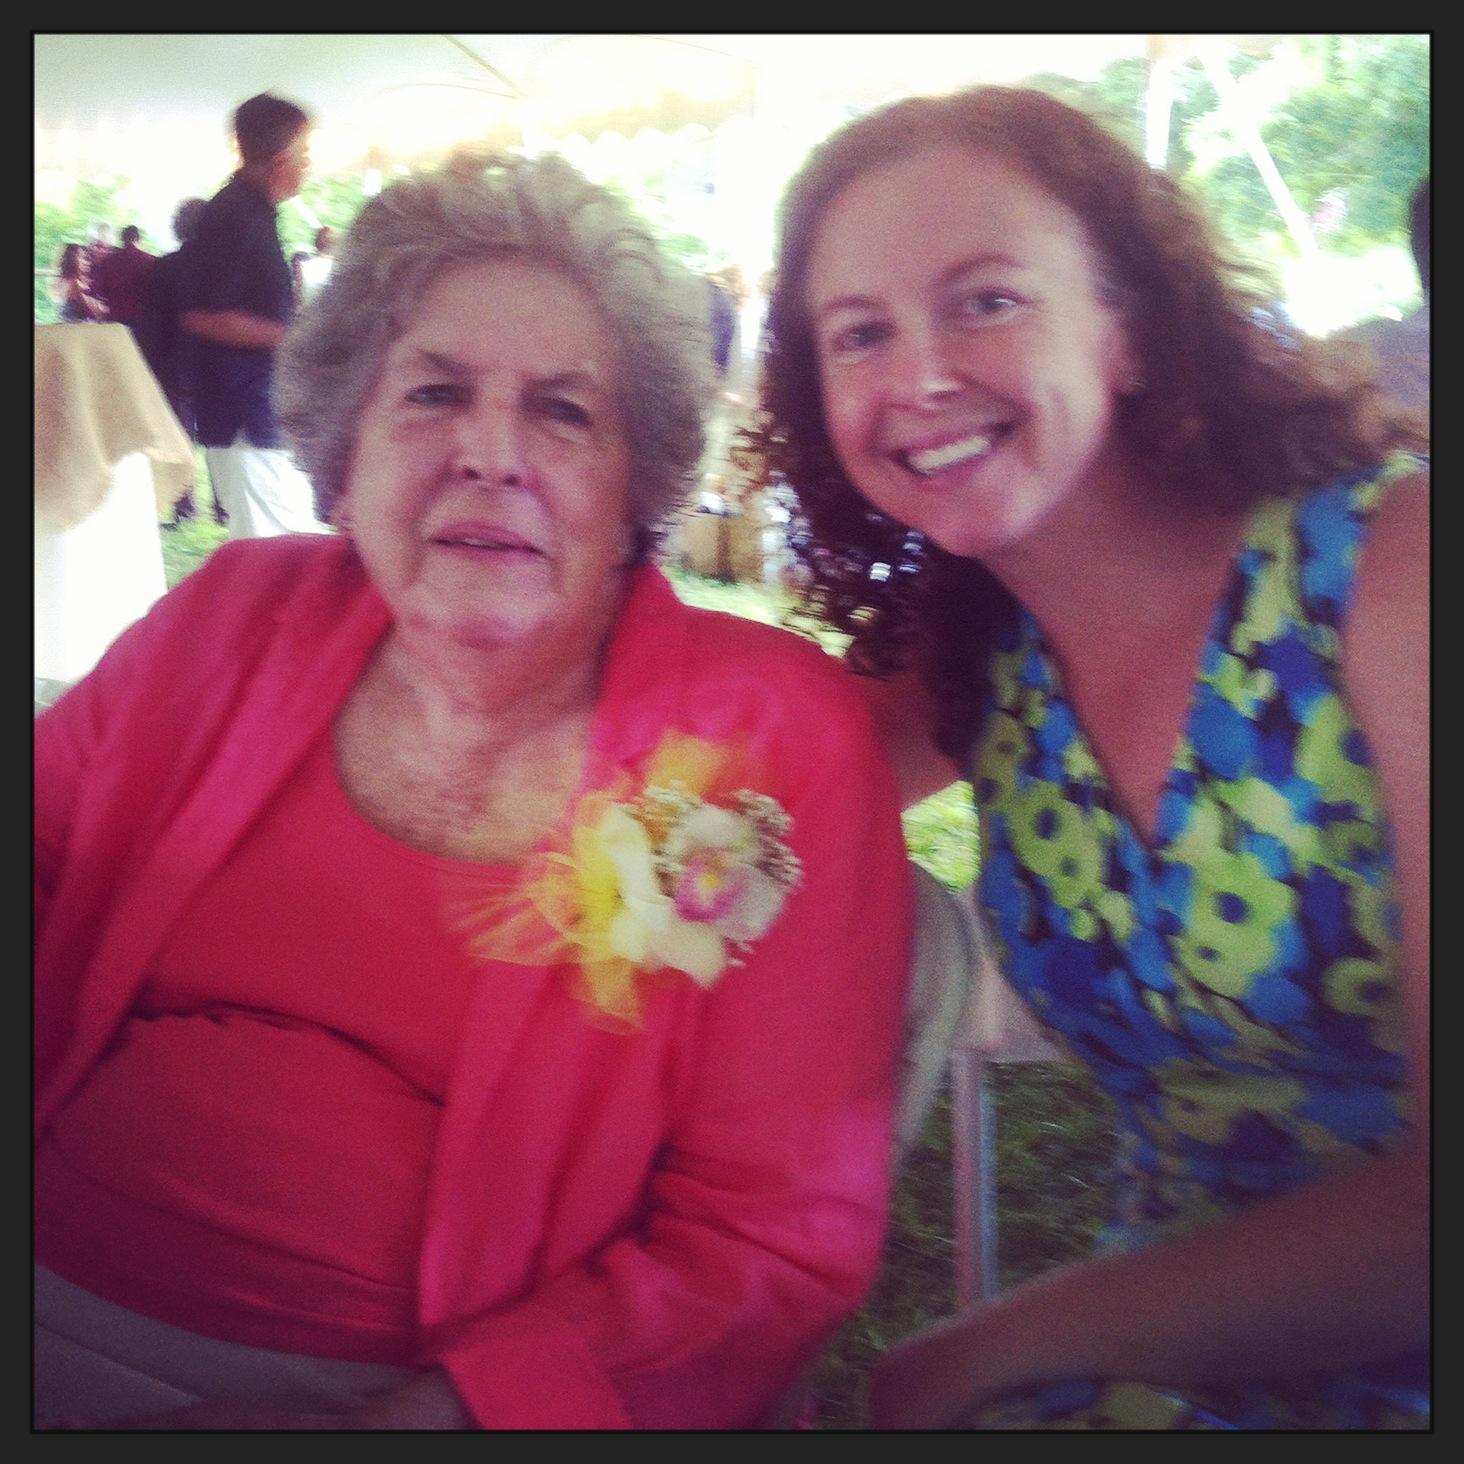 My #1 lady - My Gramma! :)